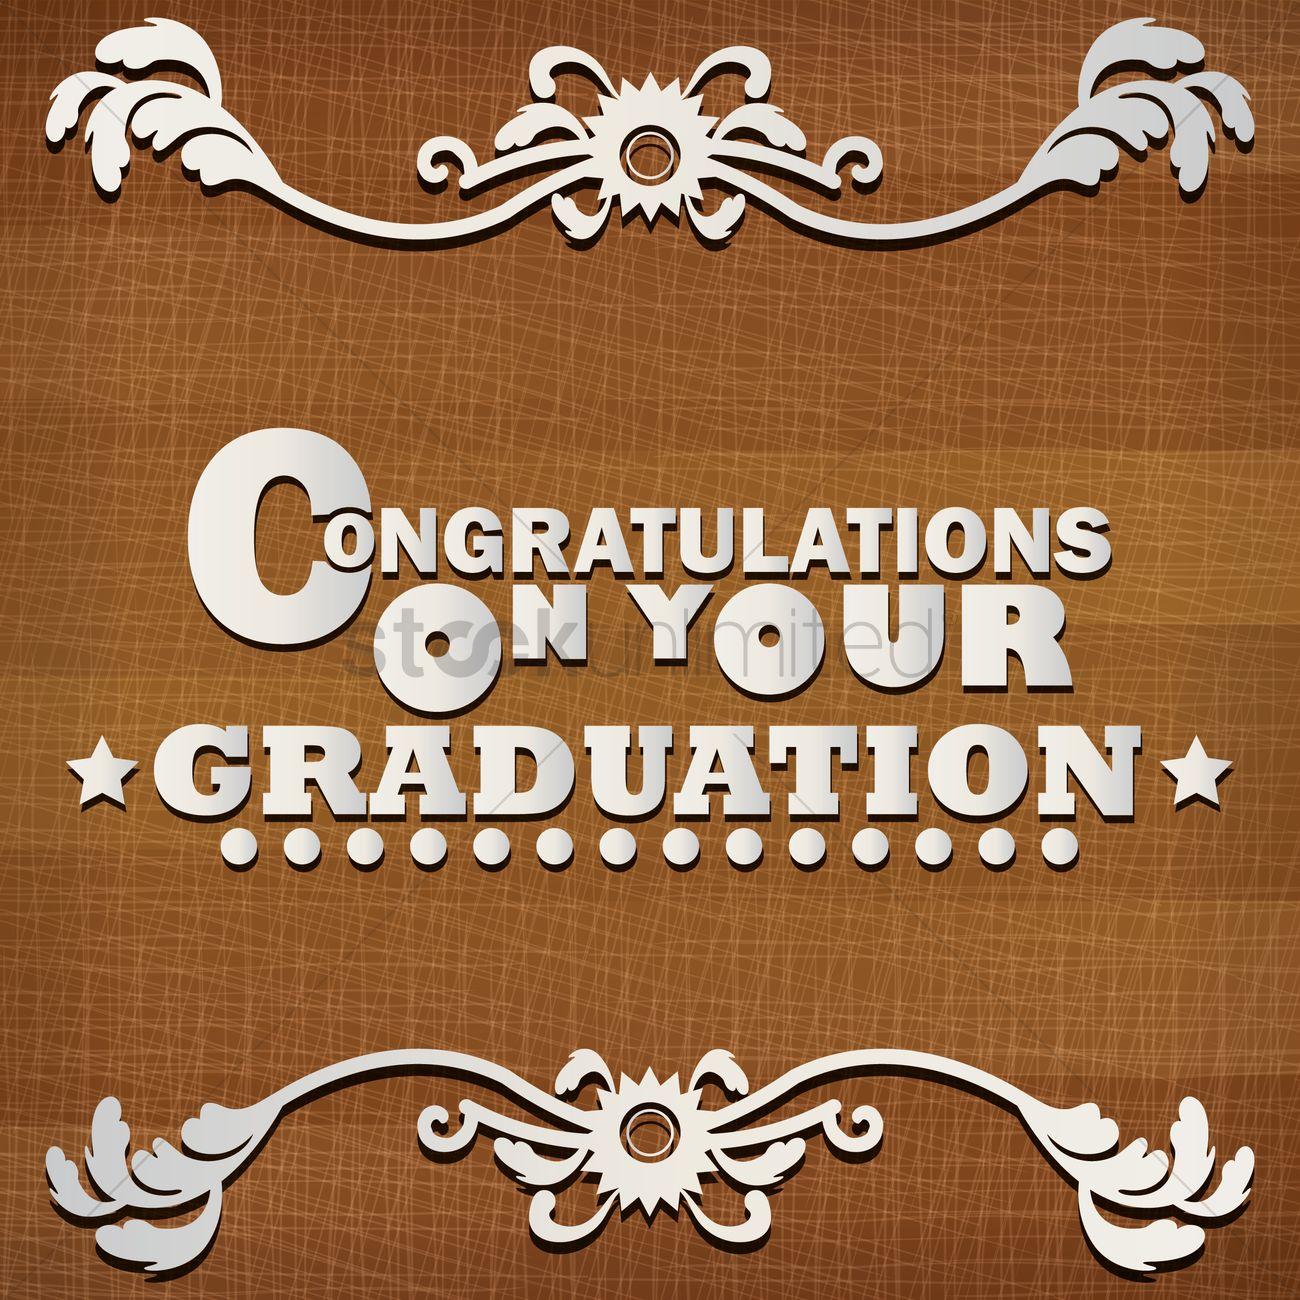 Card Cards Congratulations Congratulation Congrats Text Texts